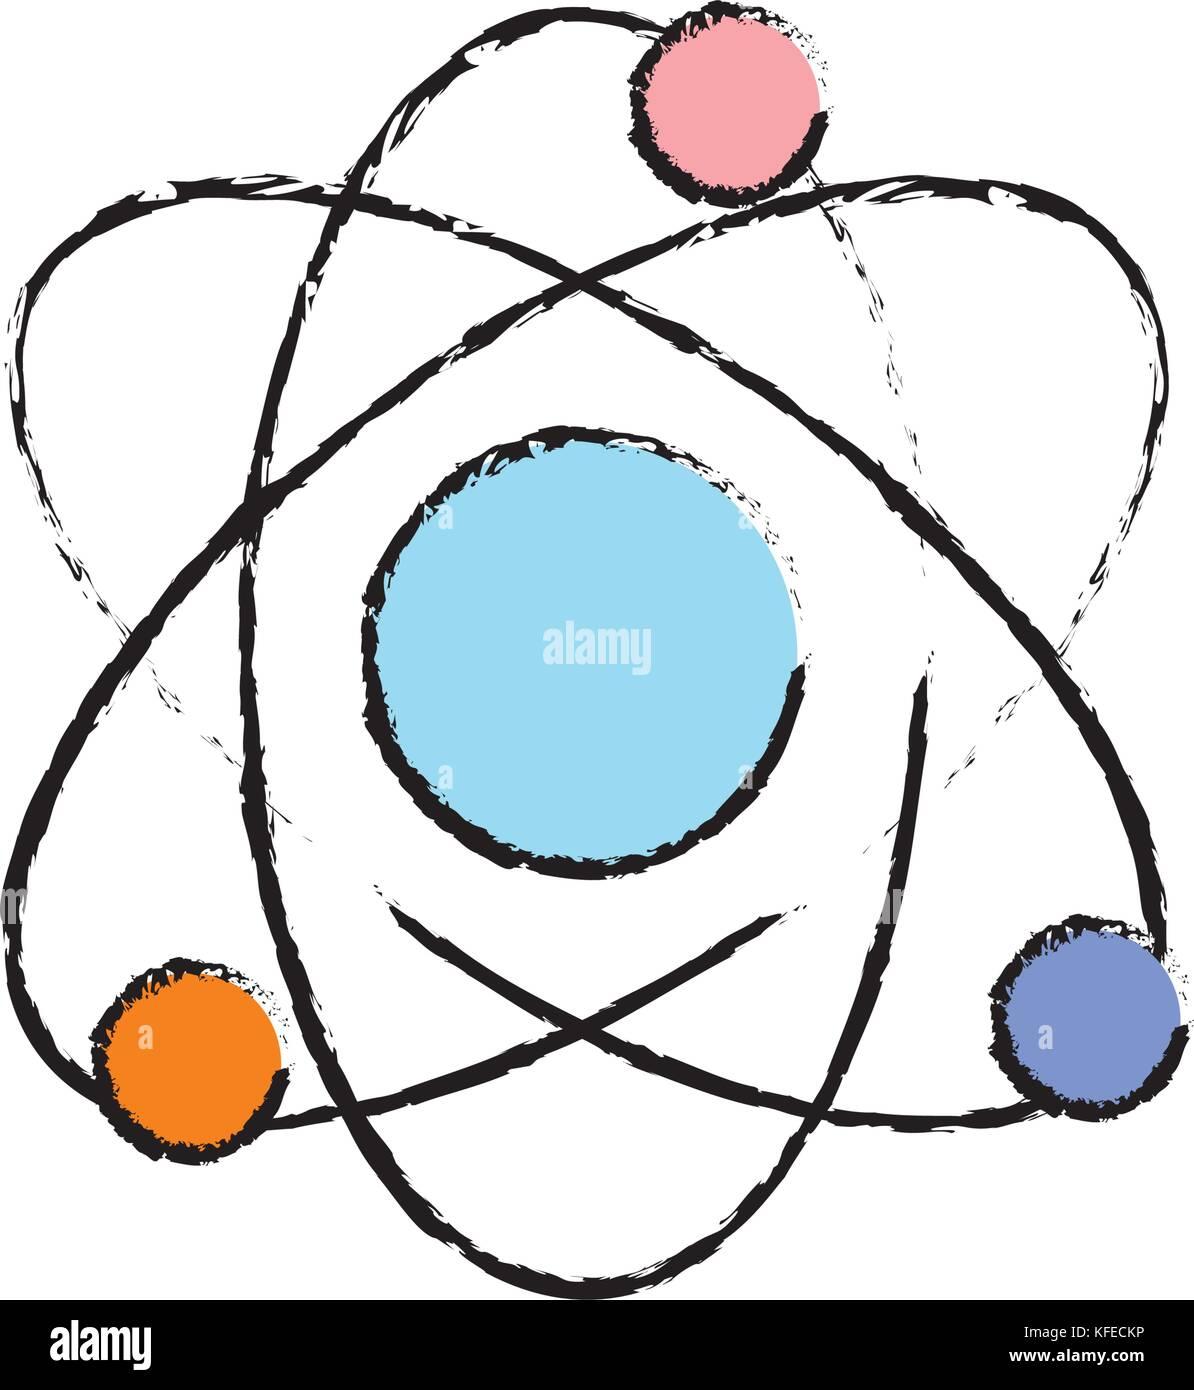 orbital diagram for beryllium honeywell room thermostat wiring electron stock photos and